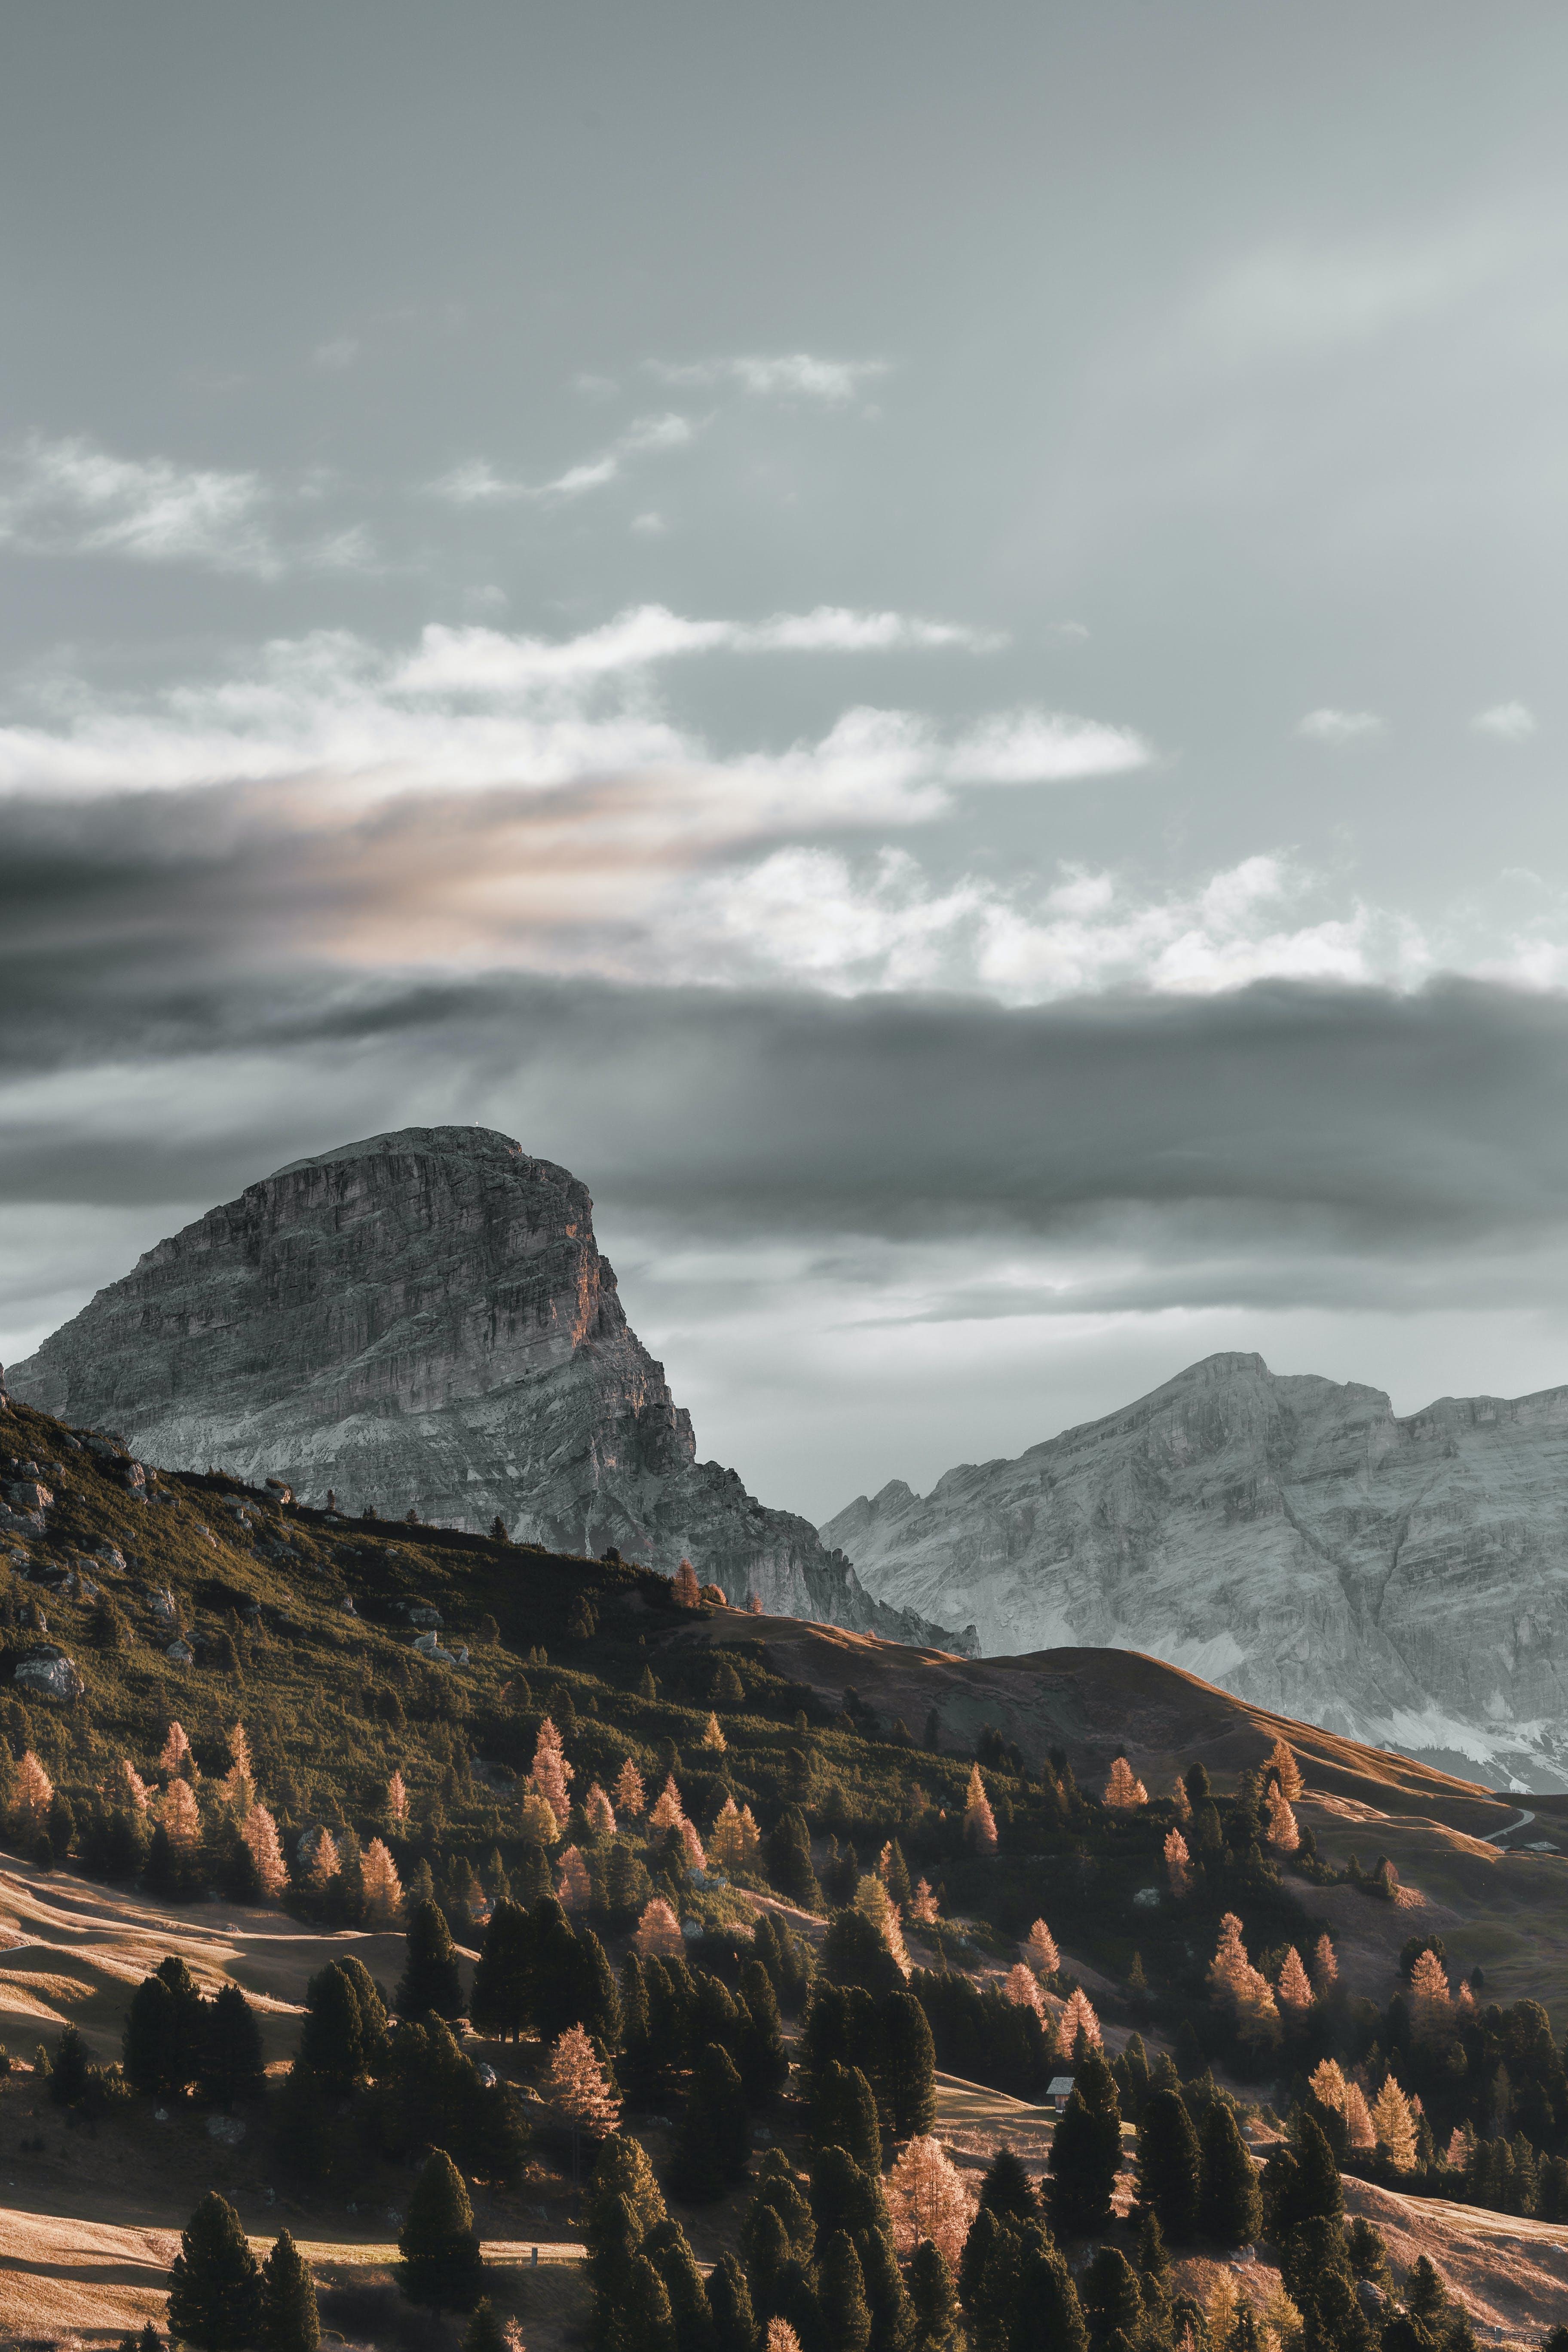 Kostenloses Stock Foto zu android wallpaper, berg, felsiger berg, hd wallpaper